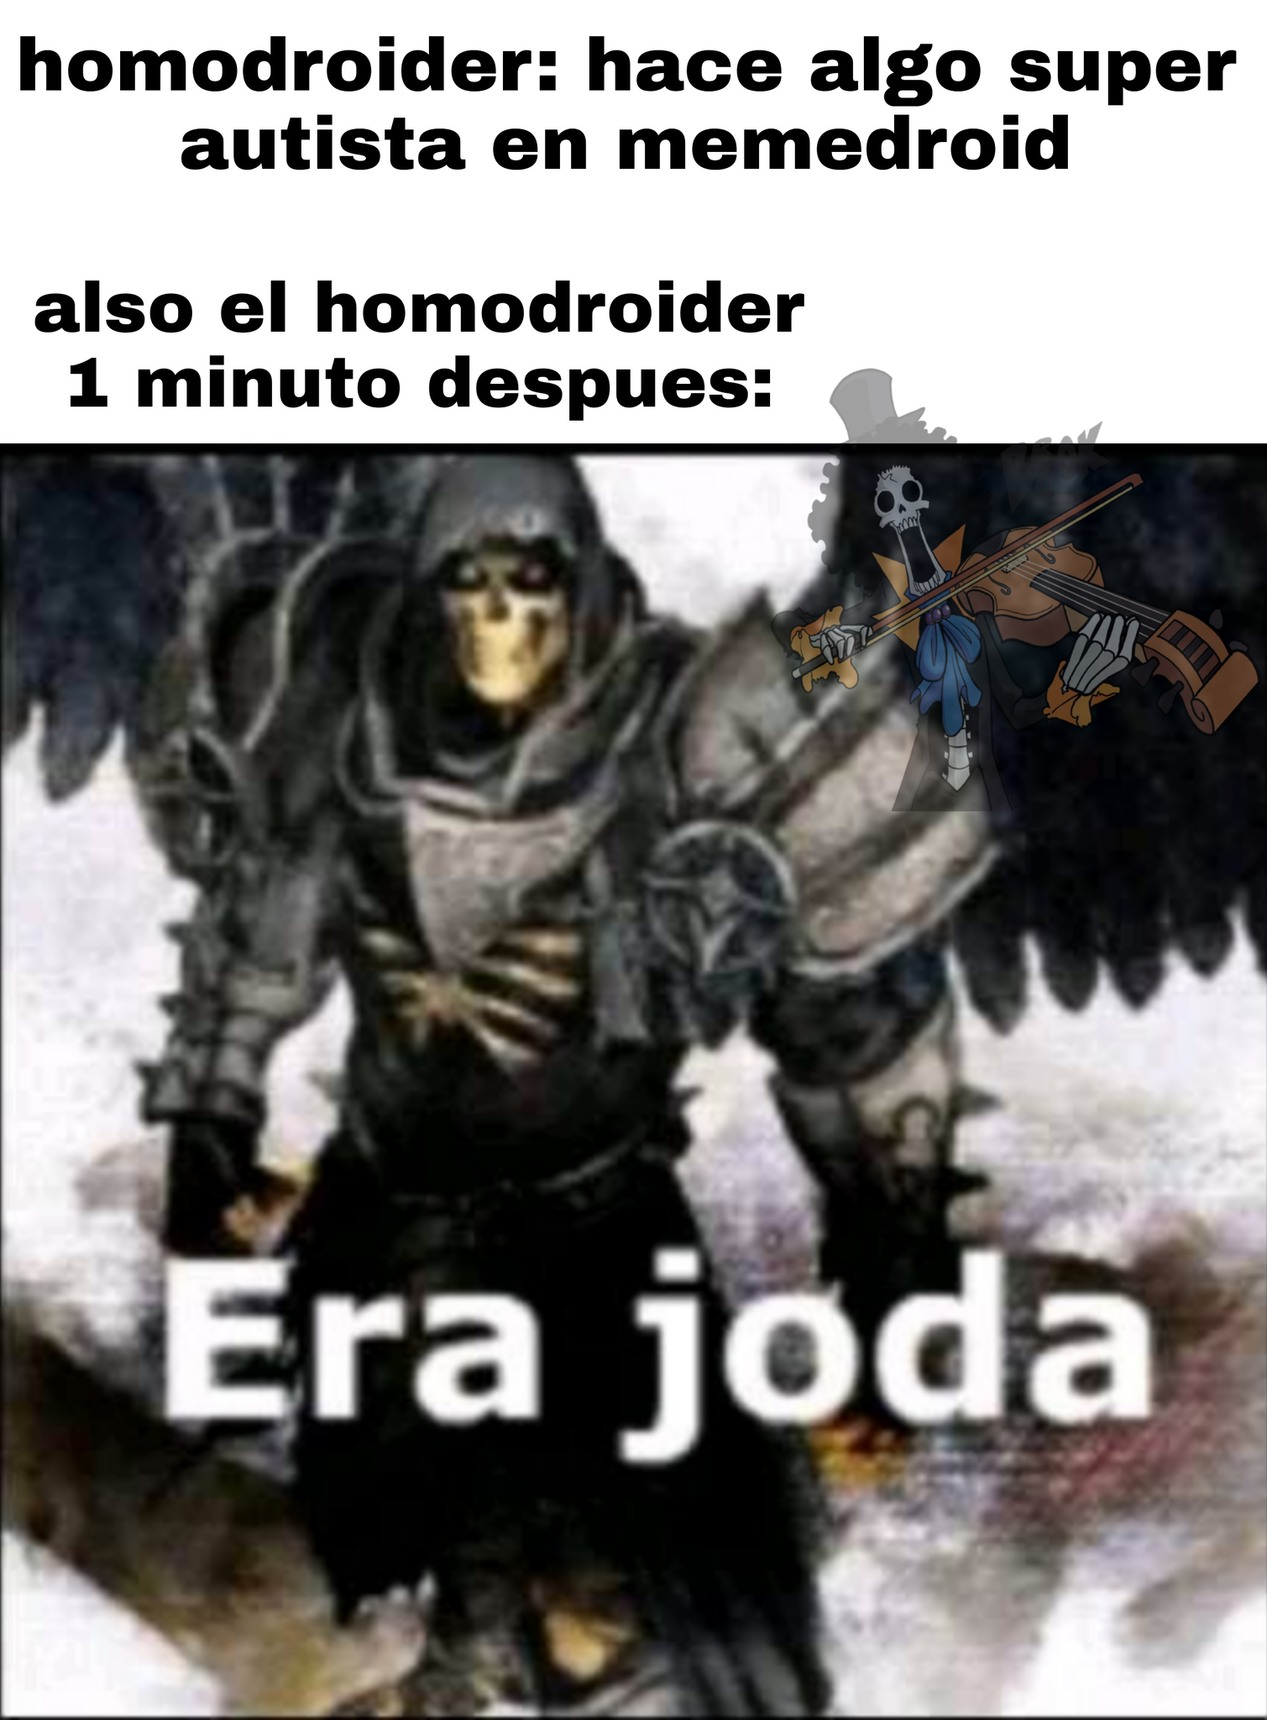 Nieguenmelo xDXdXdXDXd - meme